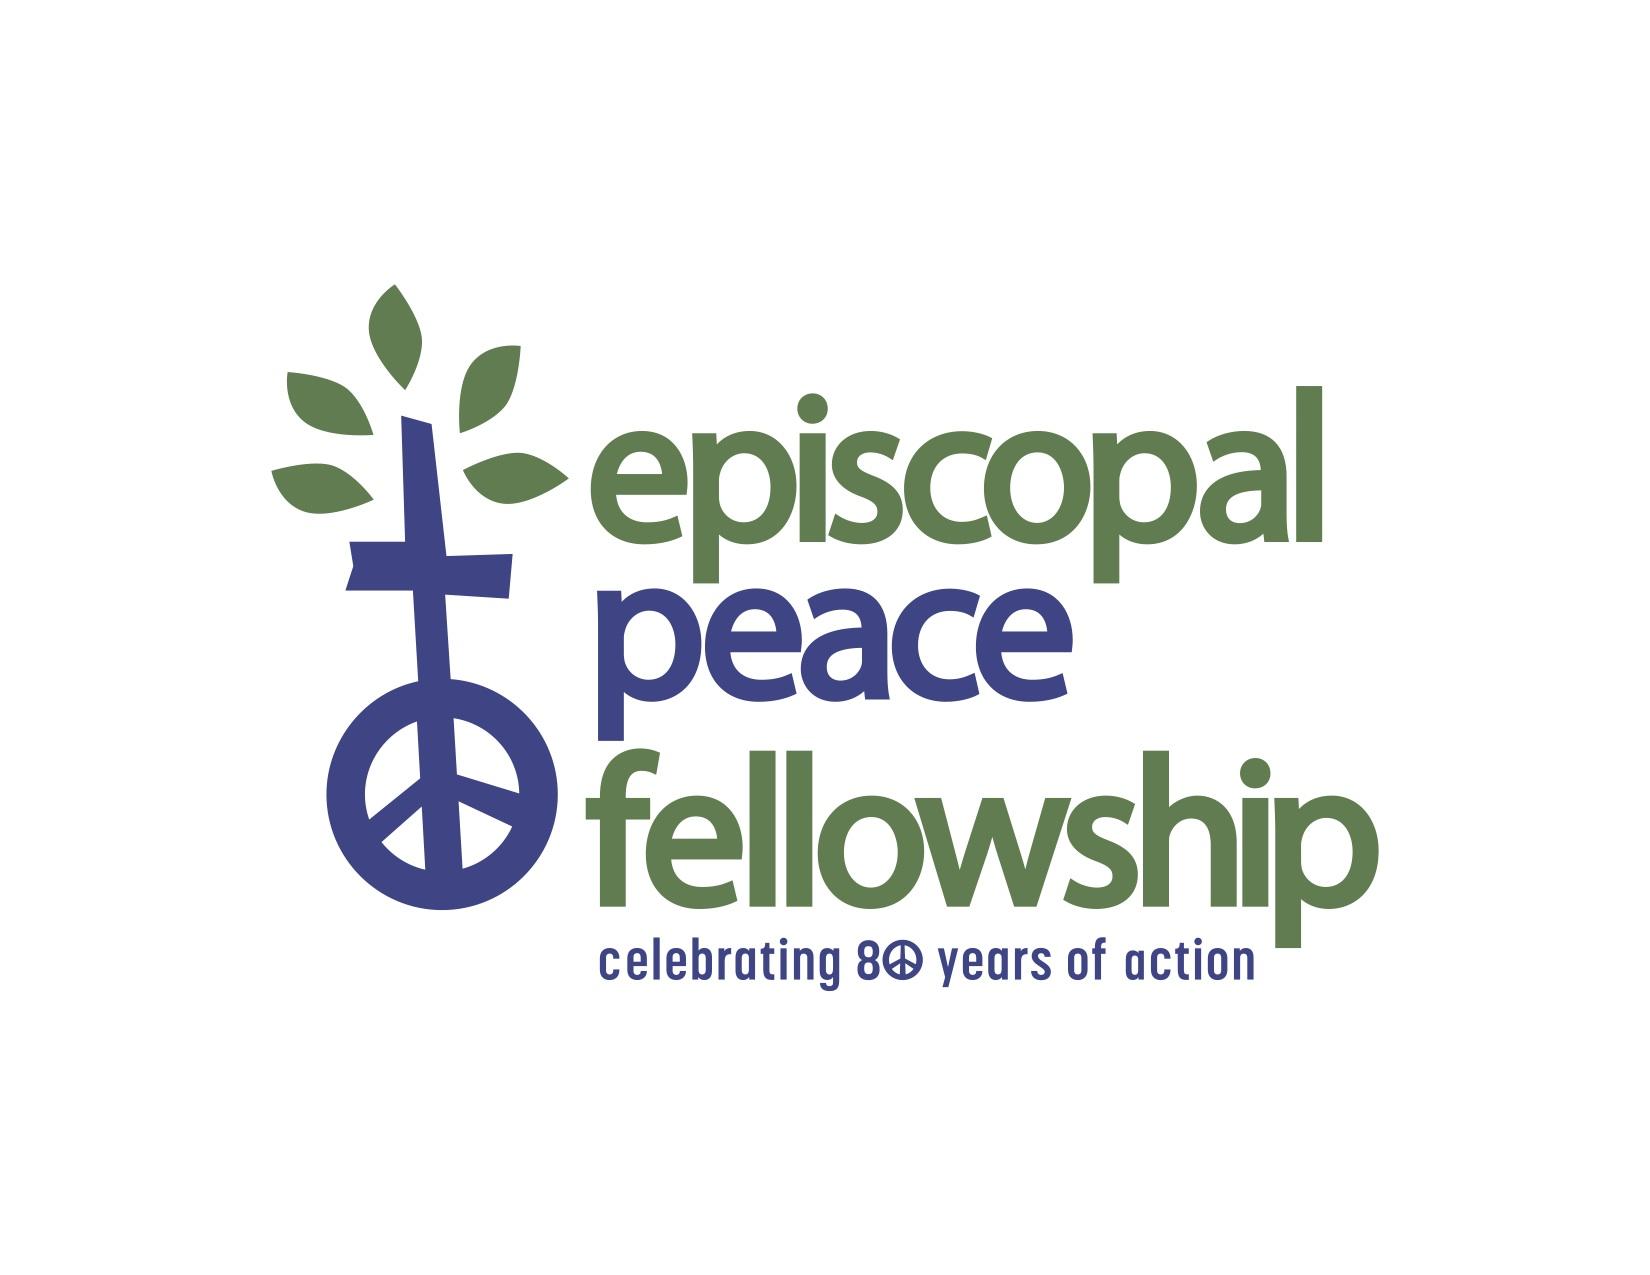 Episcopal_Peace_Fellowship (Color) - Melanie Merkle Atha.jpg